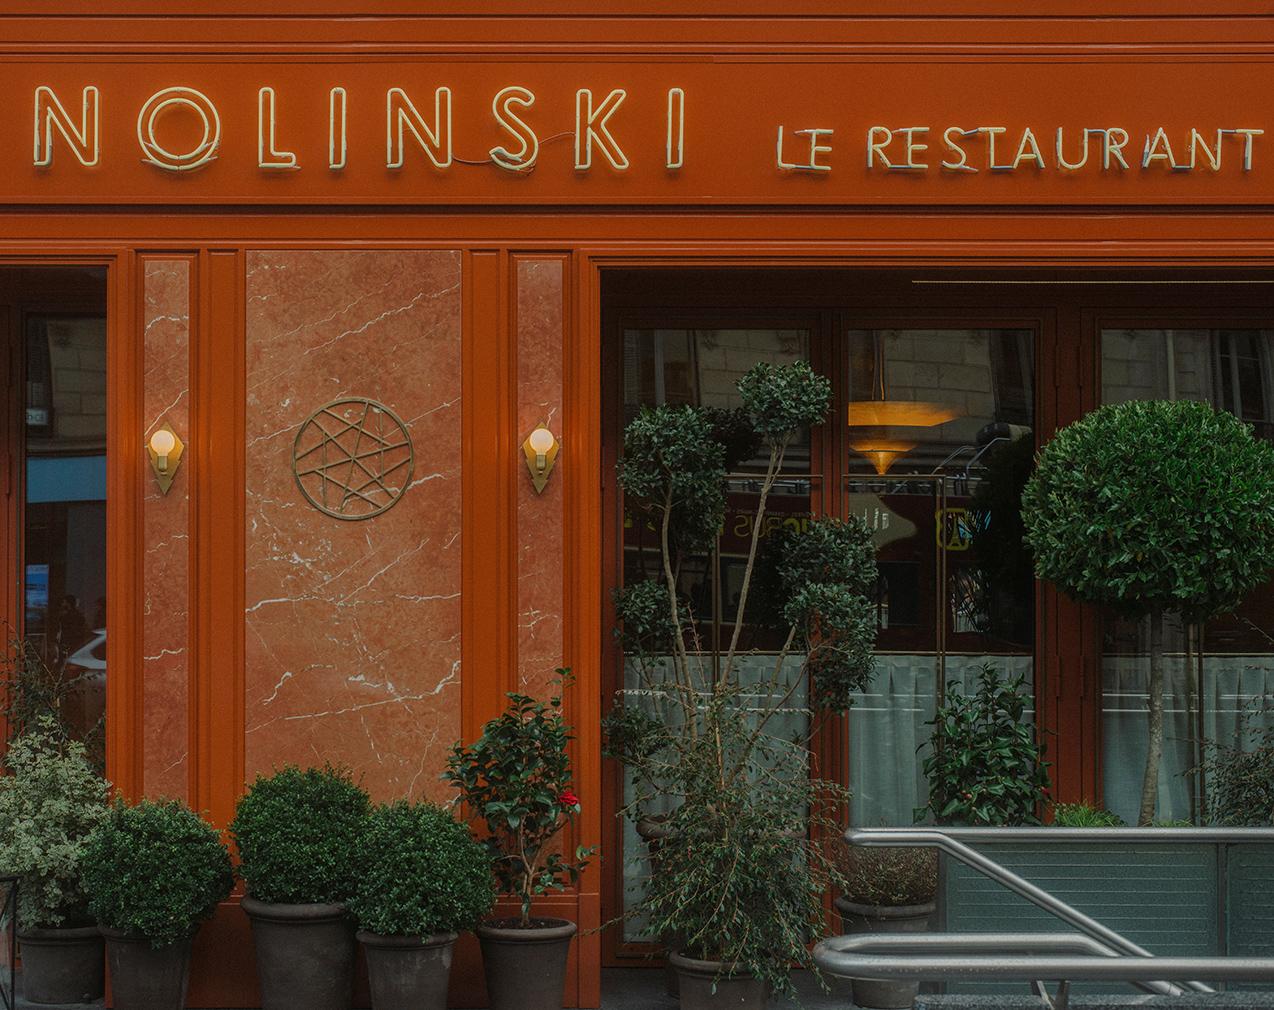 Nolinski restaurant fuses art deco and 70s styles